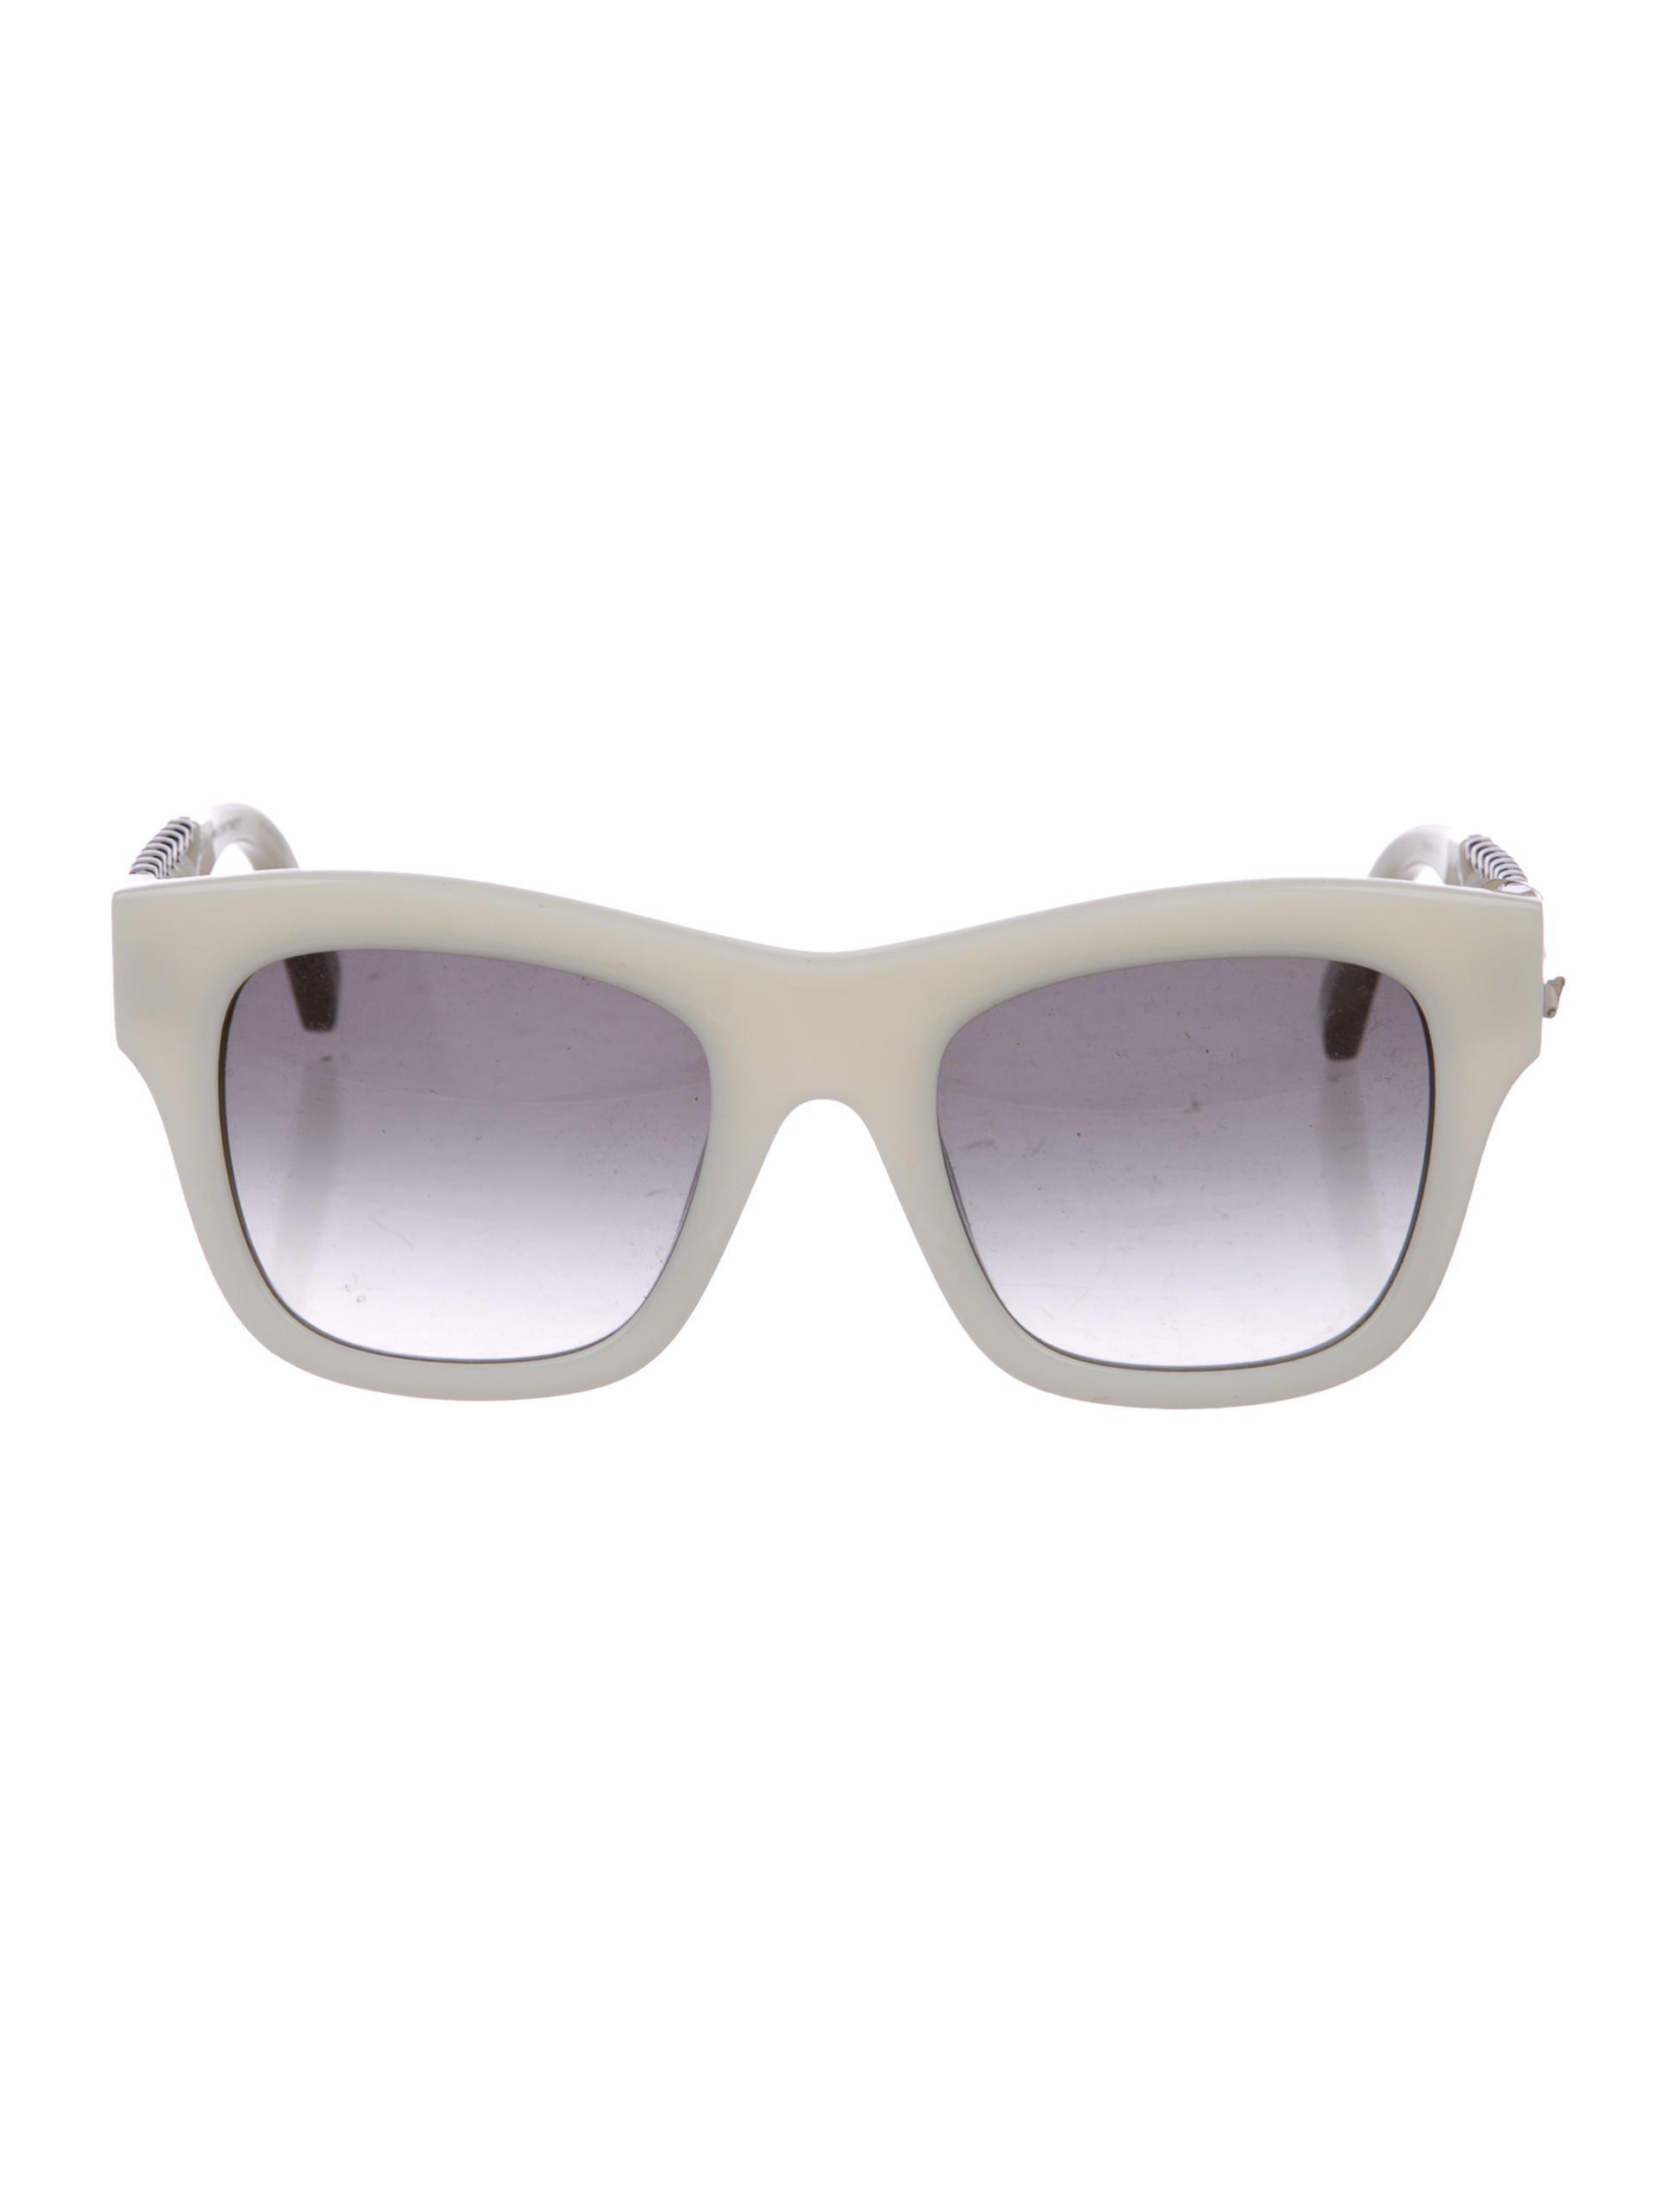 80010effd Stella McCartney. Women's Metallic Square-frame Gradient Sunglasses White